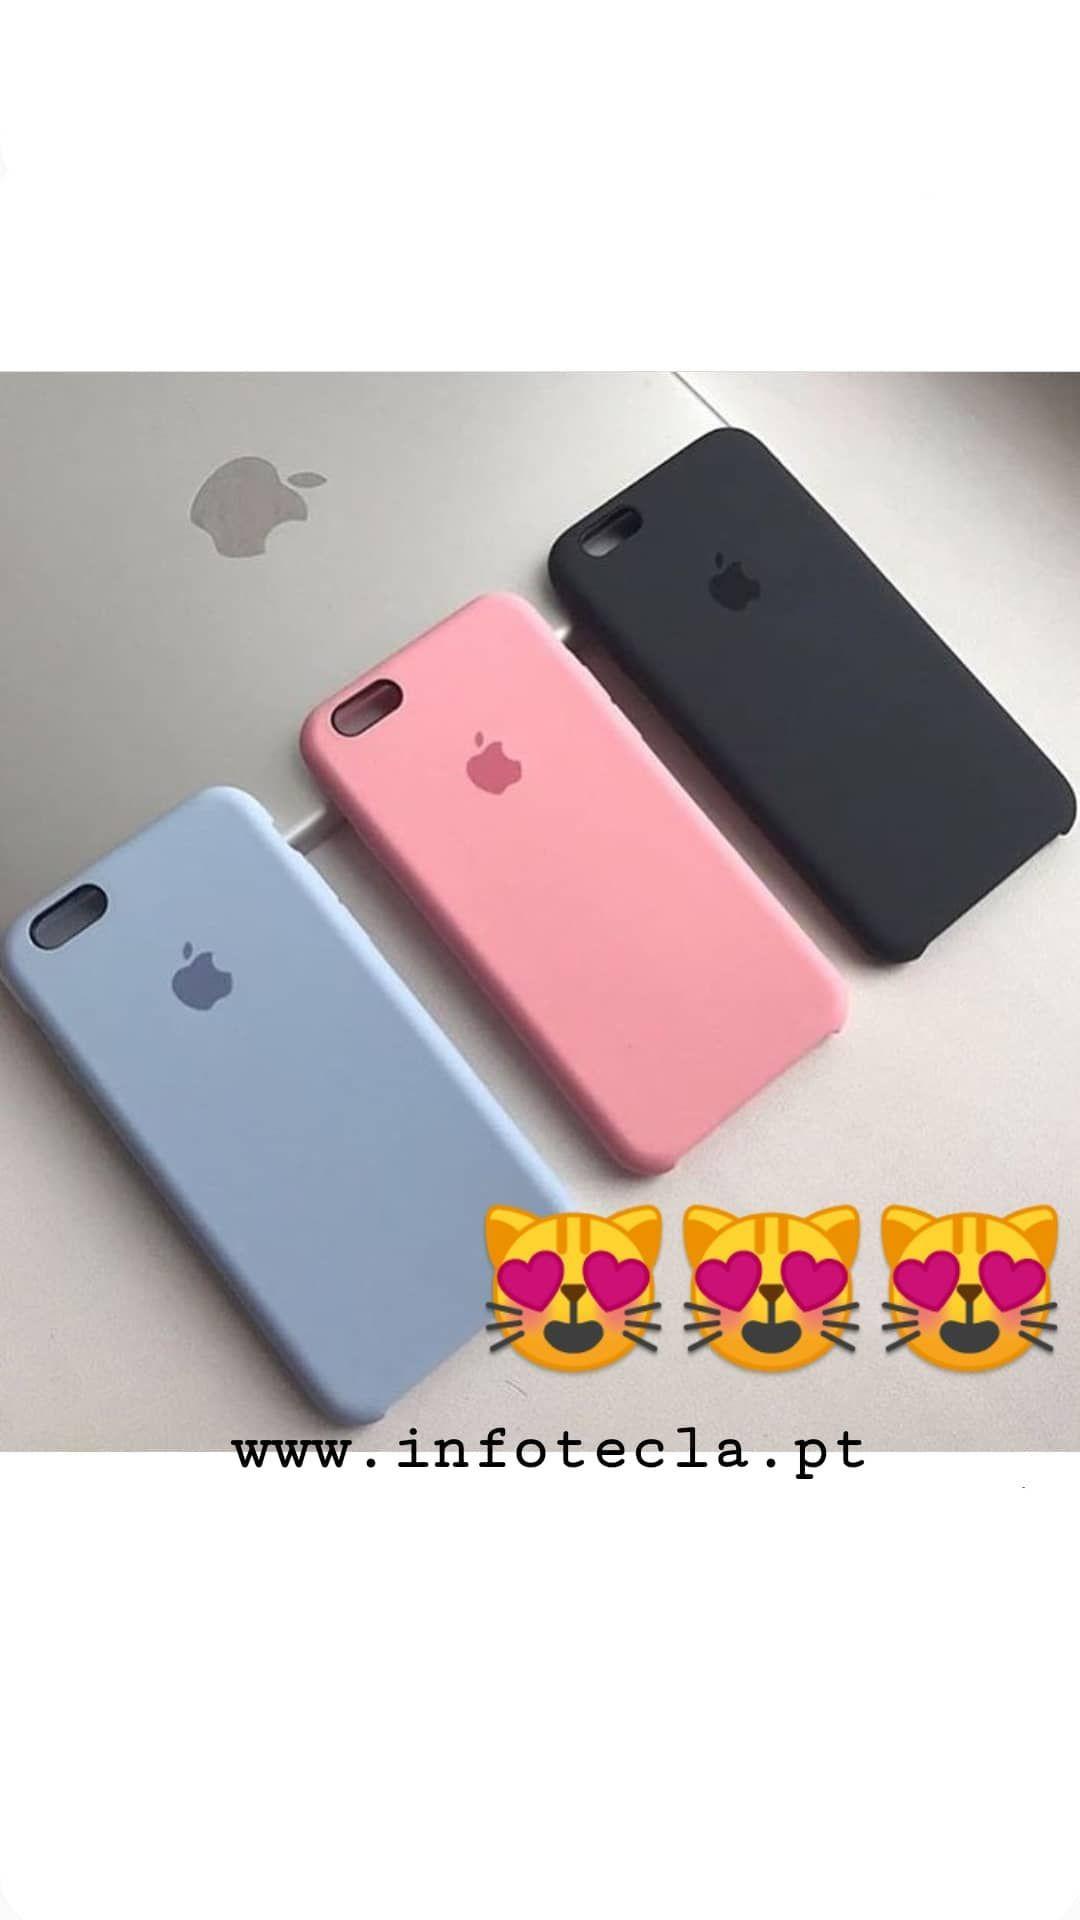 funda iphone 6 rosa pastel